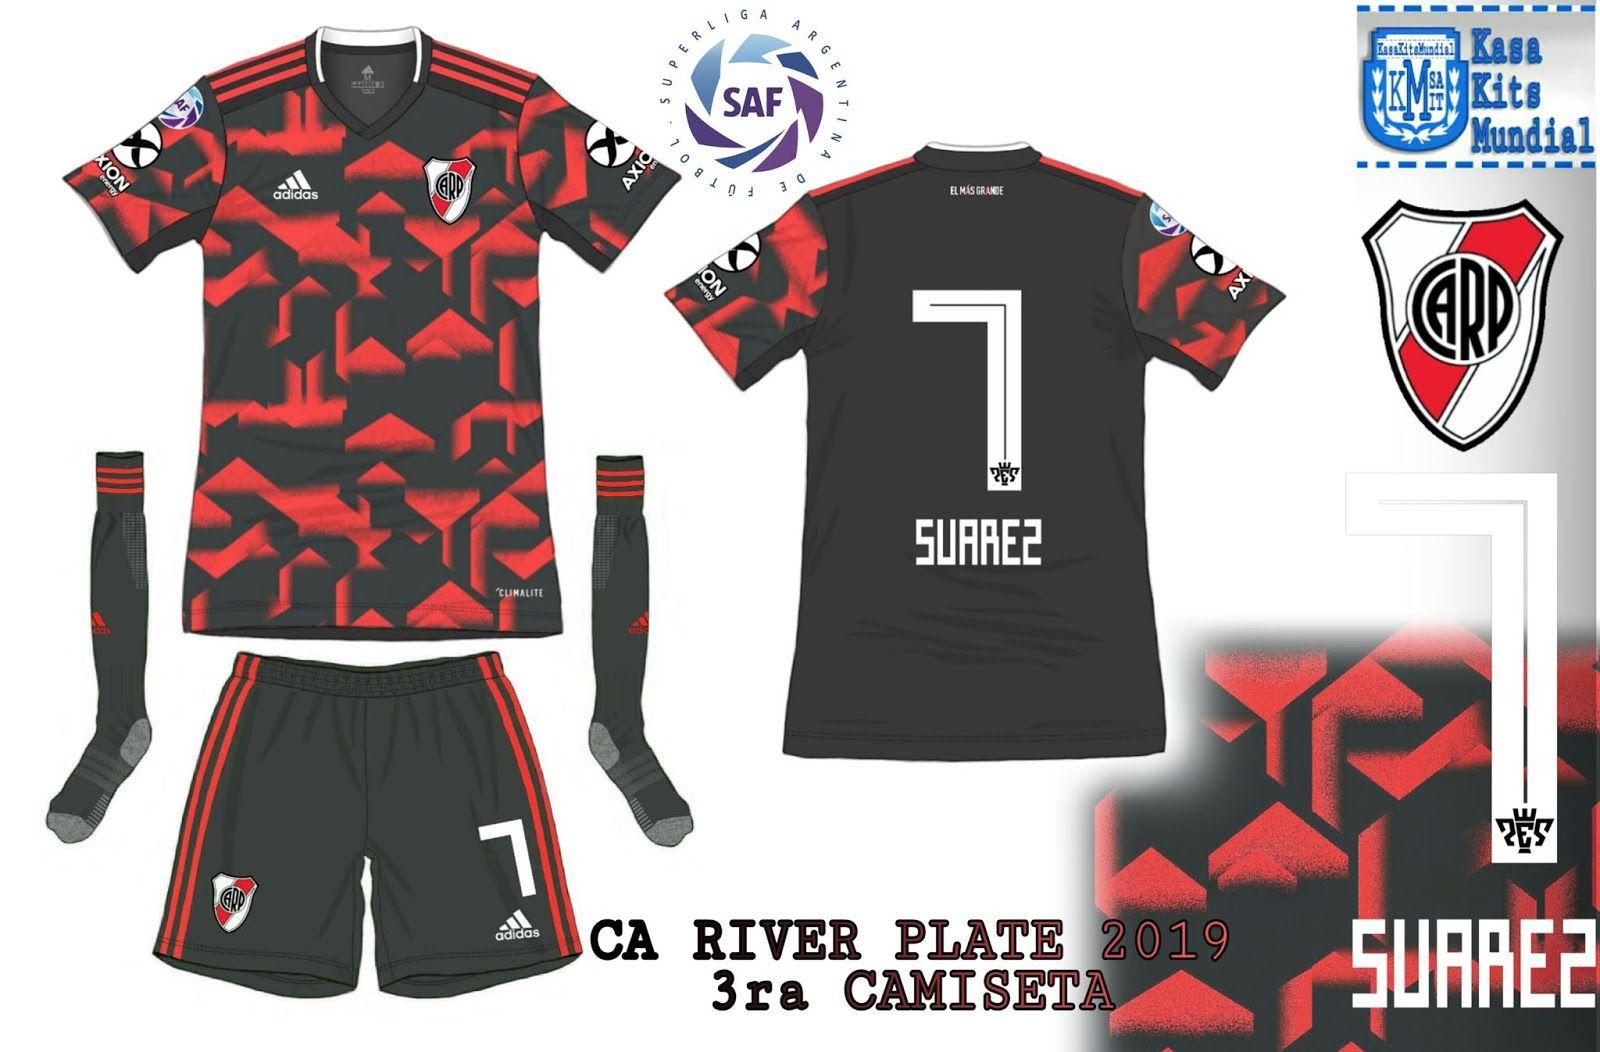 3f3bb422013 CasaKits Mundial: Camiseta Del CA San Lorenzo de Almagro (Arg) 2019    Casakits mundial   Camisetas, Fútbol, Santos